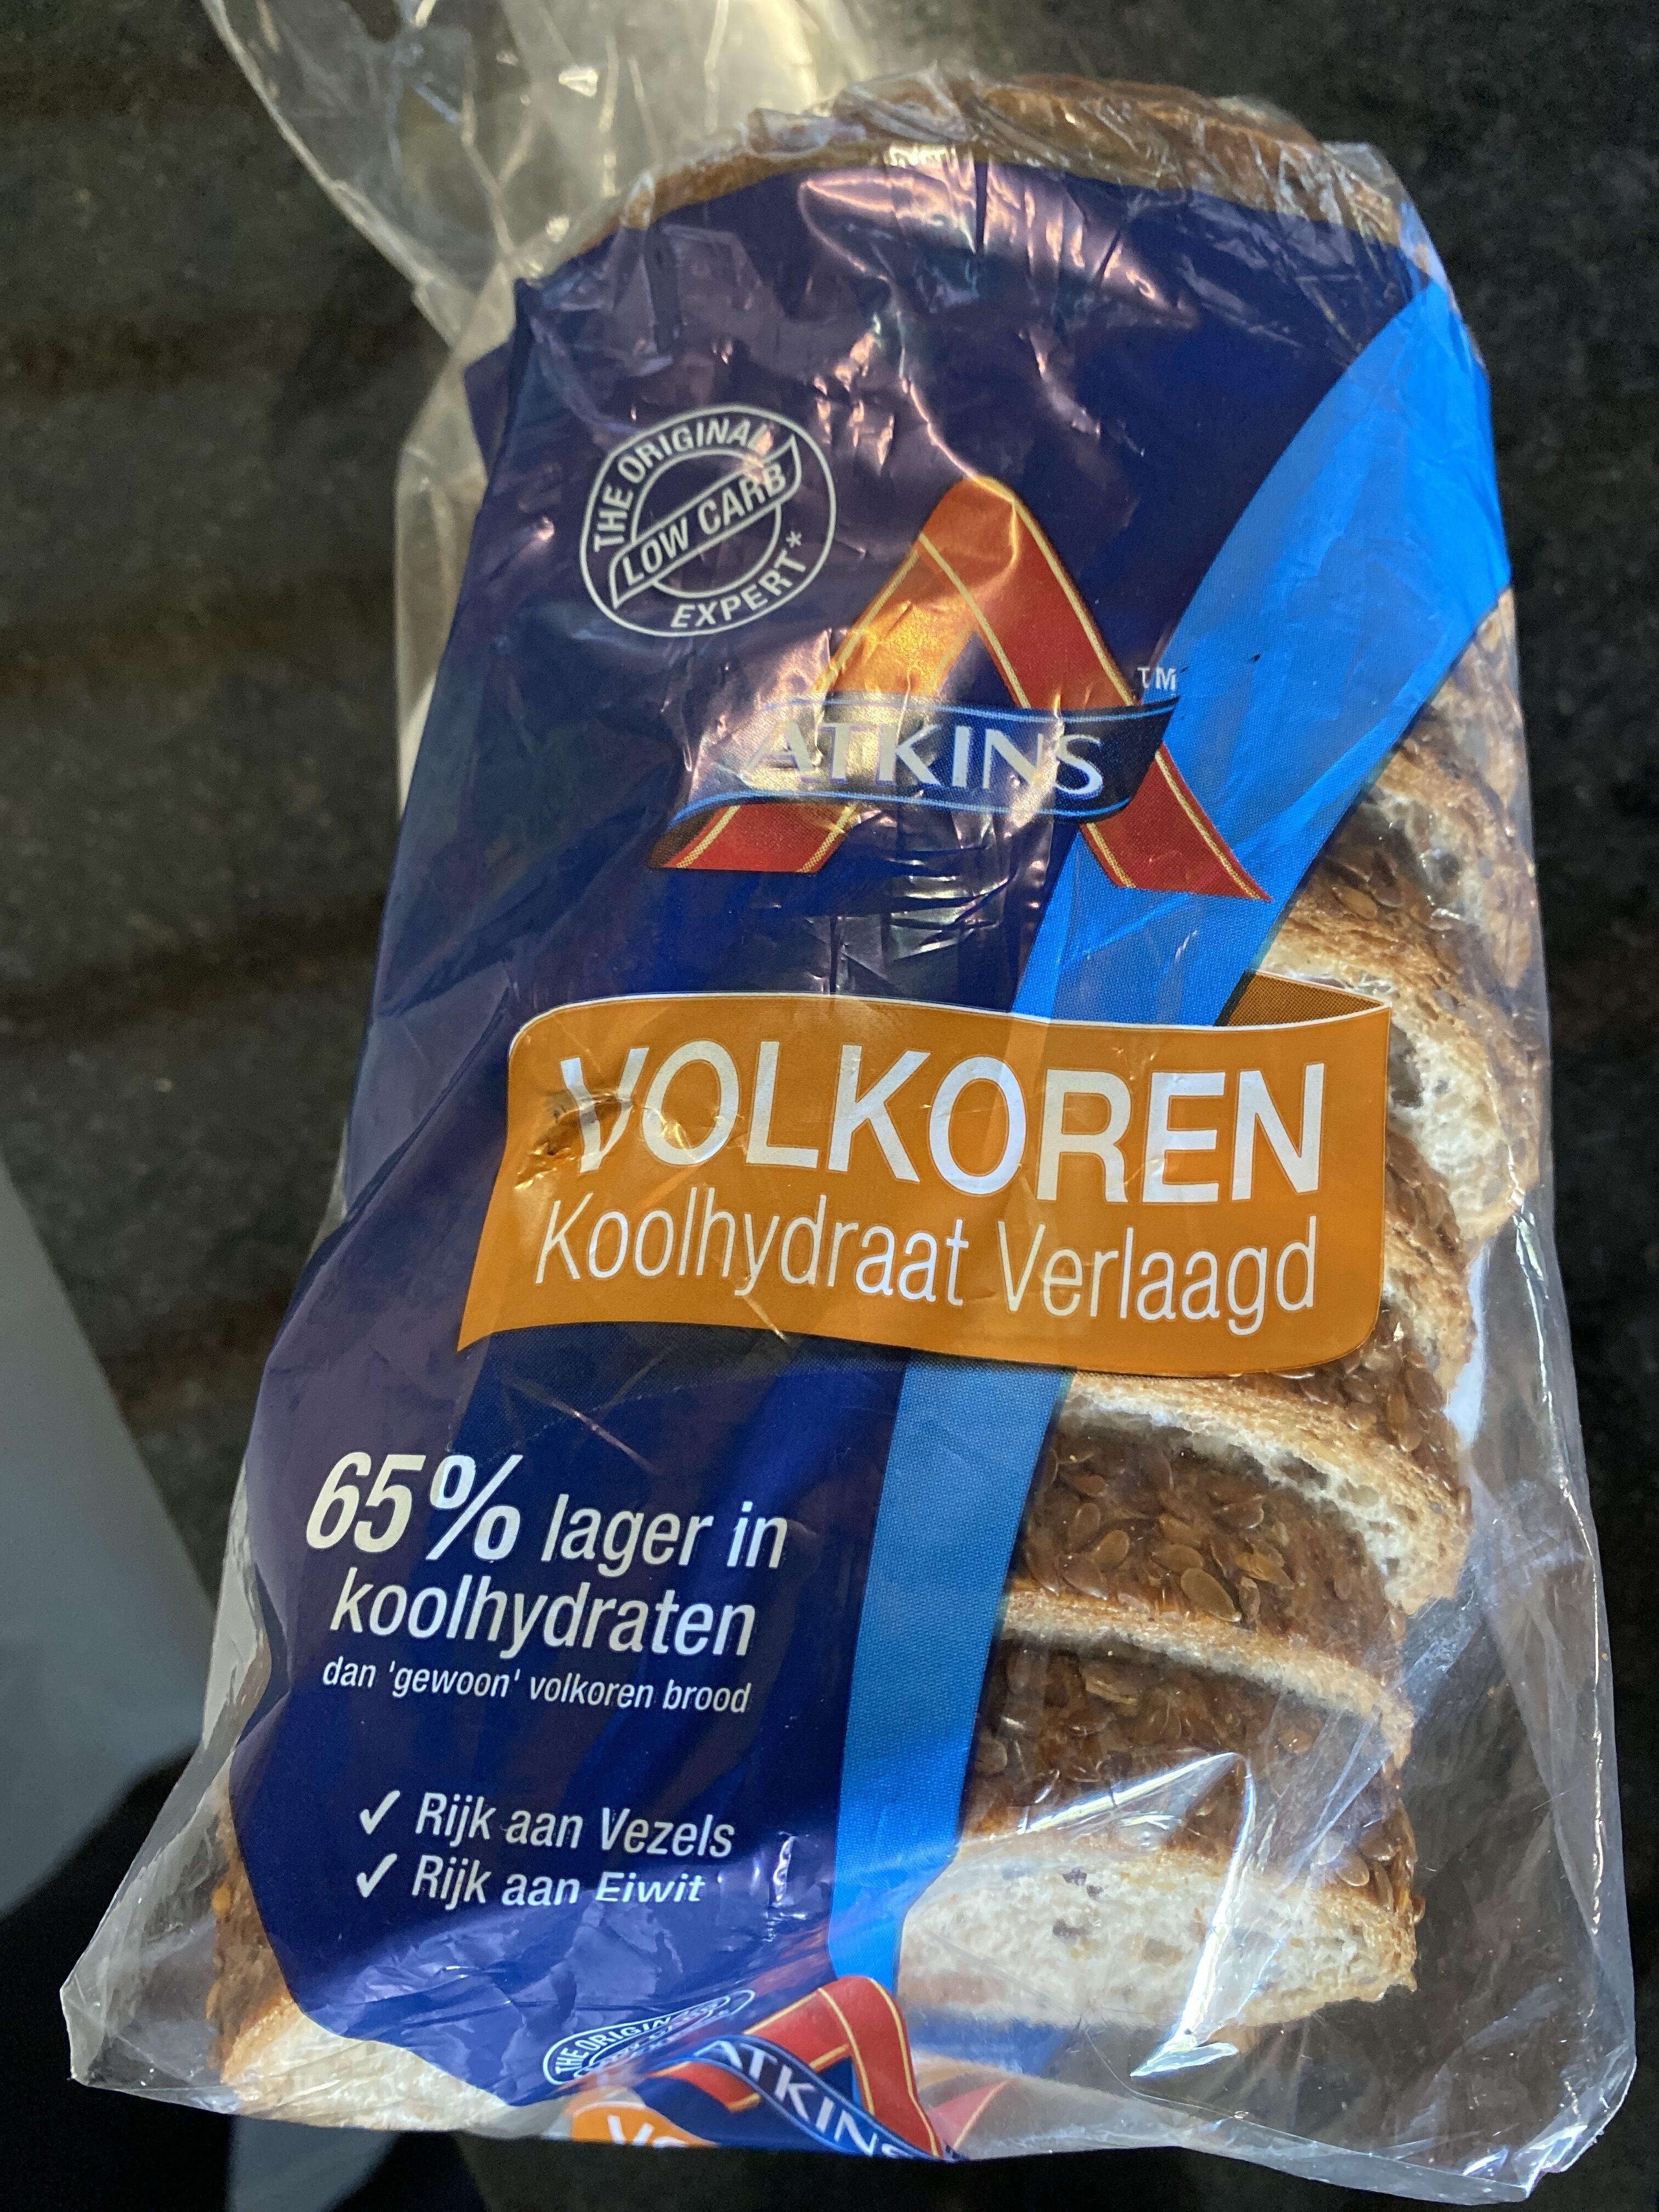 Volkoren koolhydraad verlaagd - Product - nl